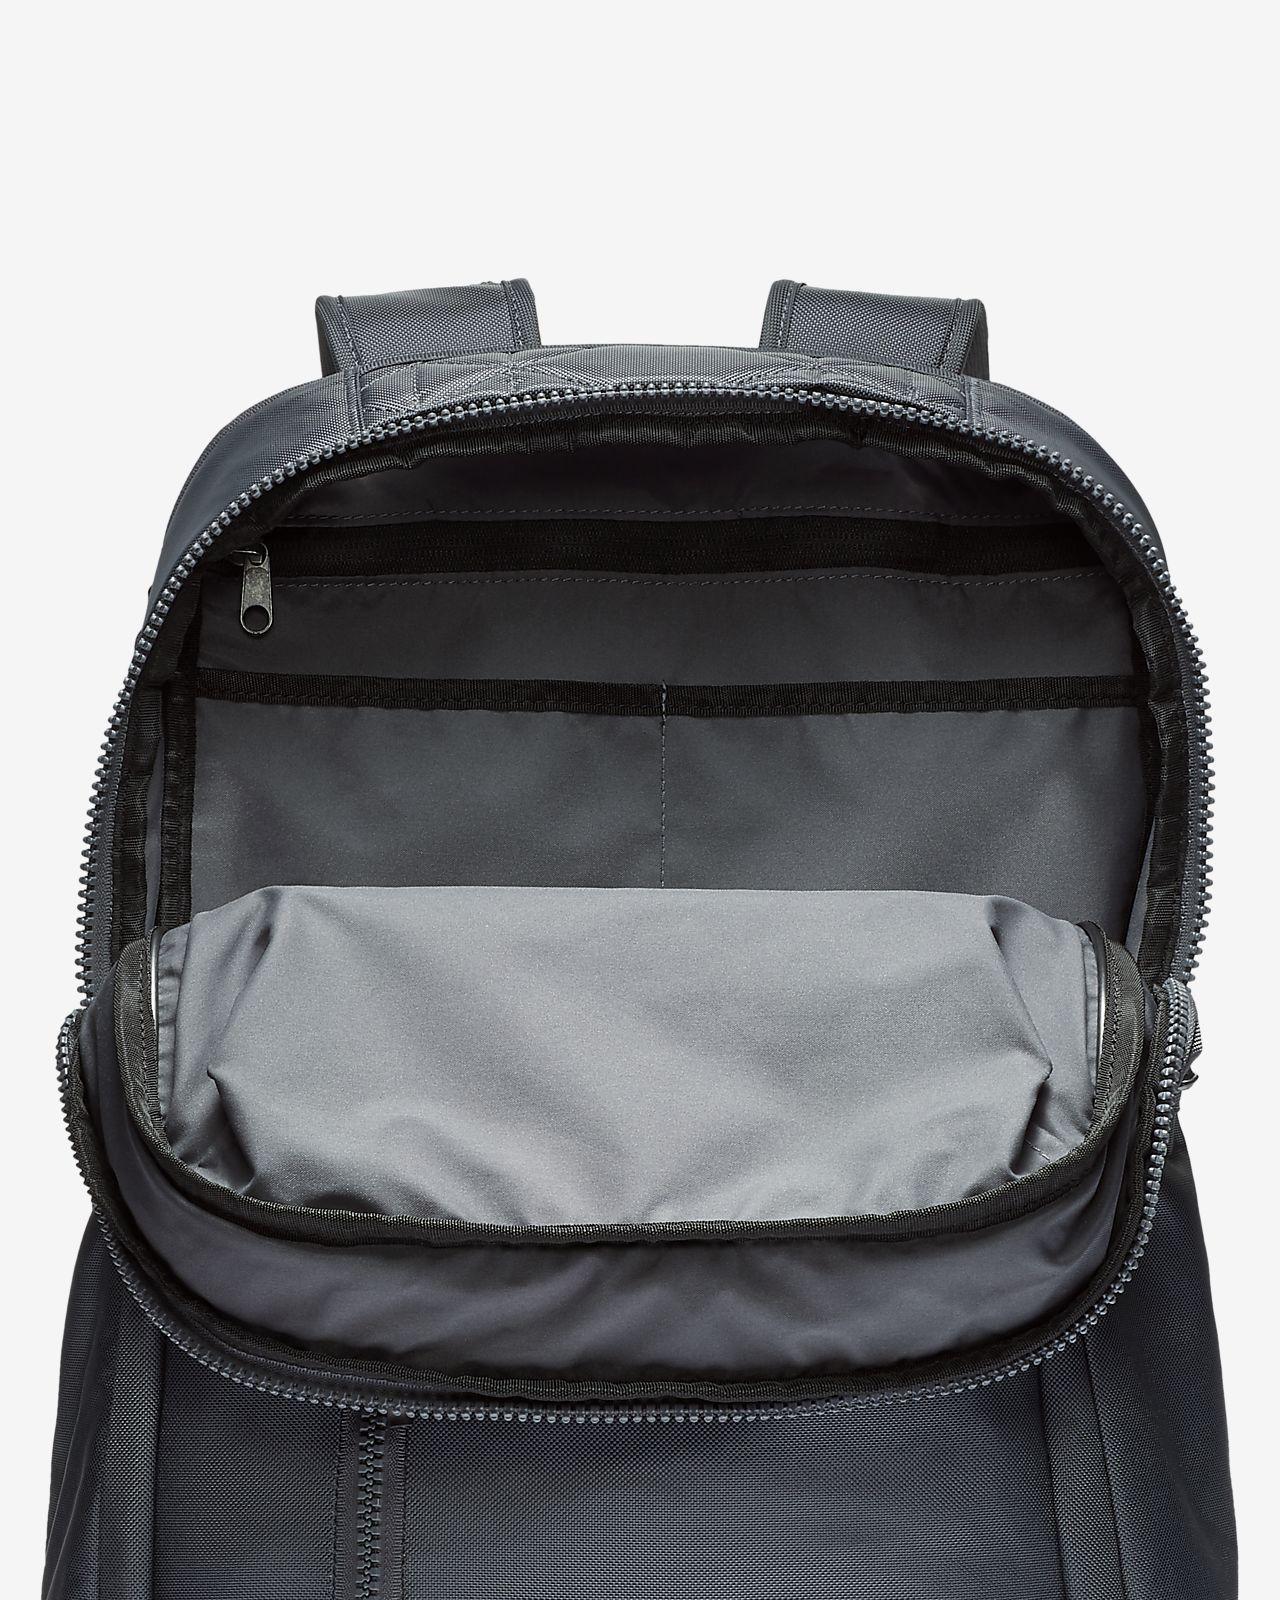 46616c456d505 Plecak treningowy Nike Vapor Power 2.0. Nike.com PL